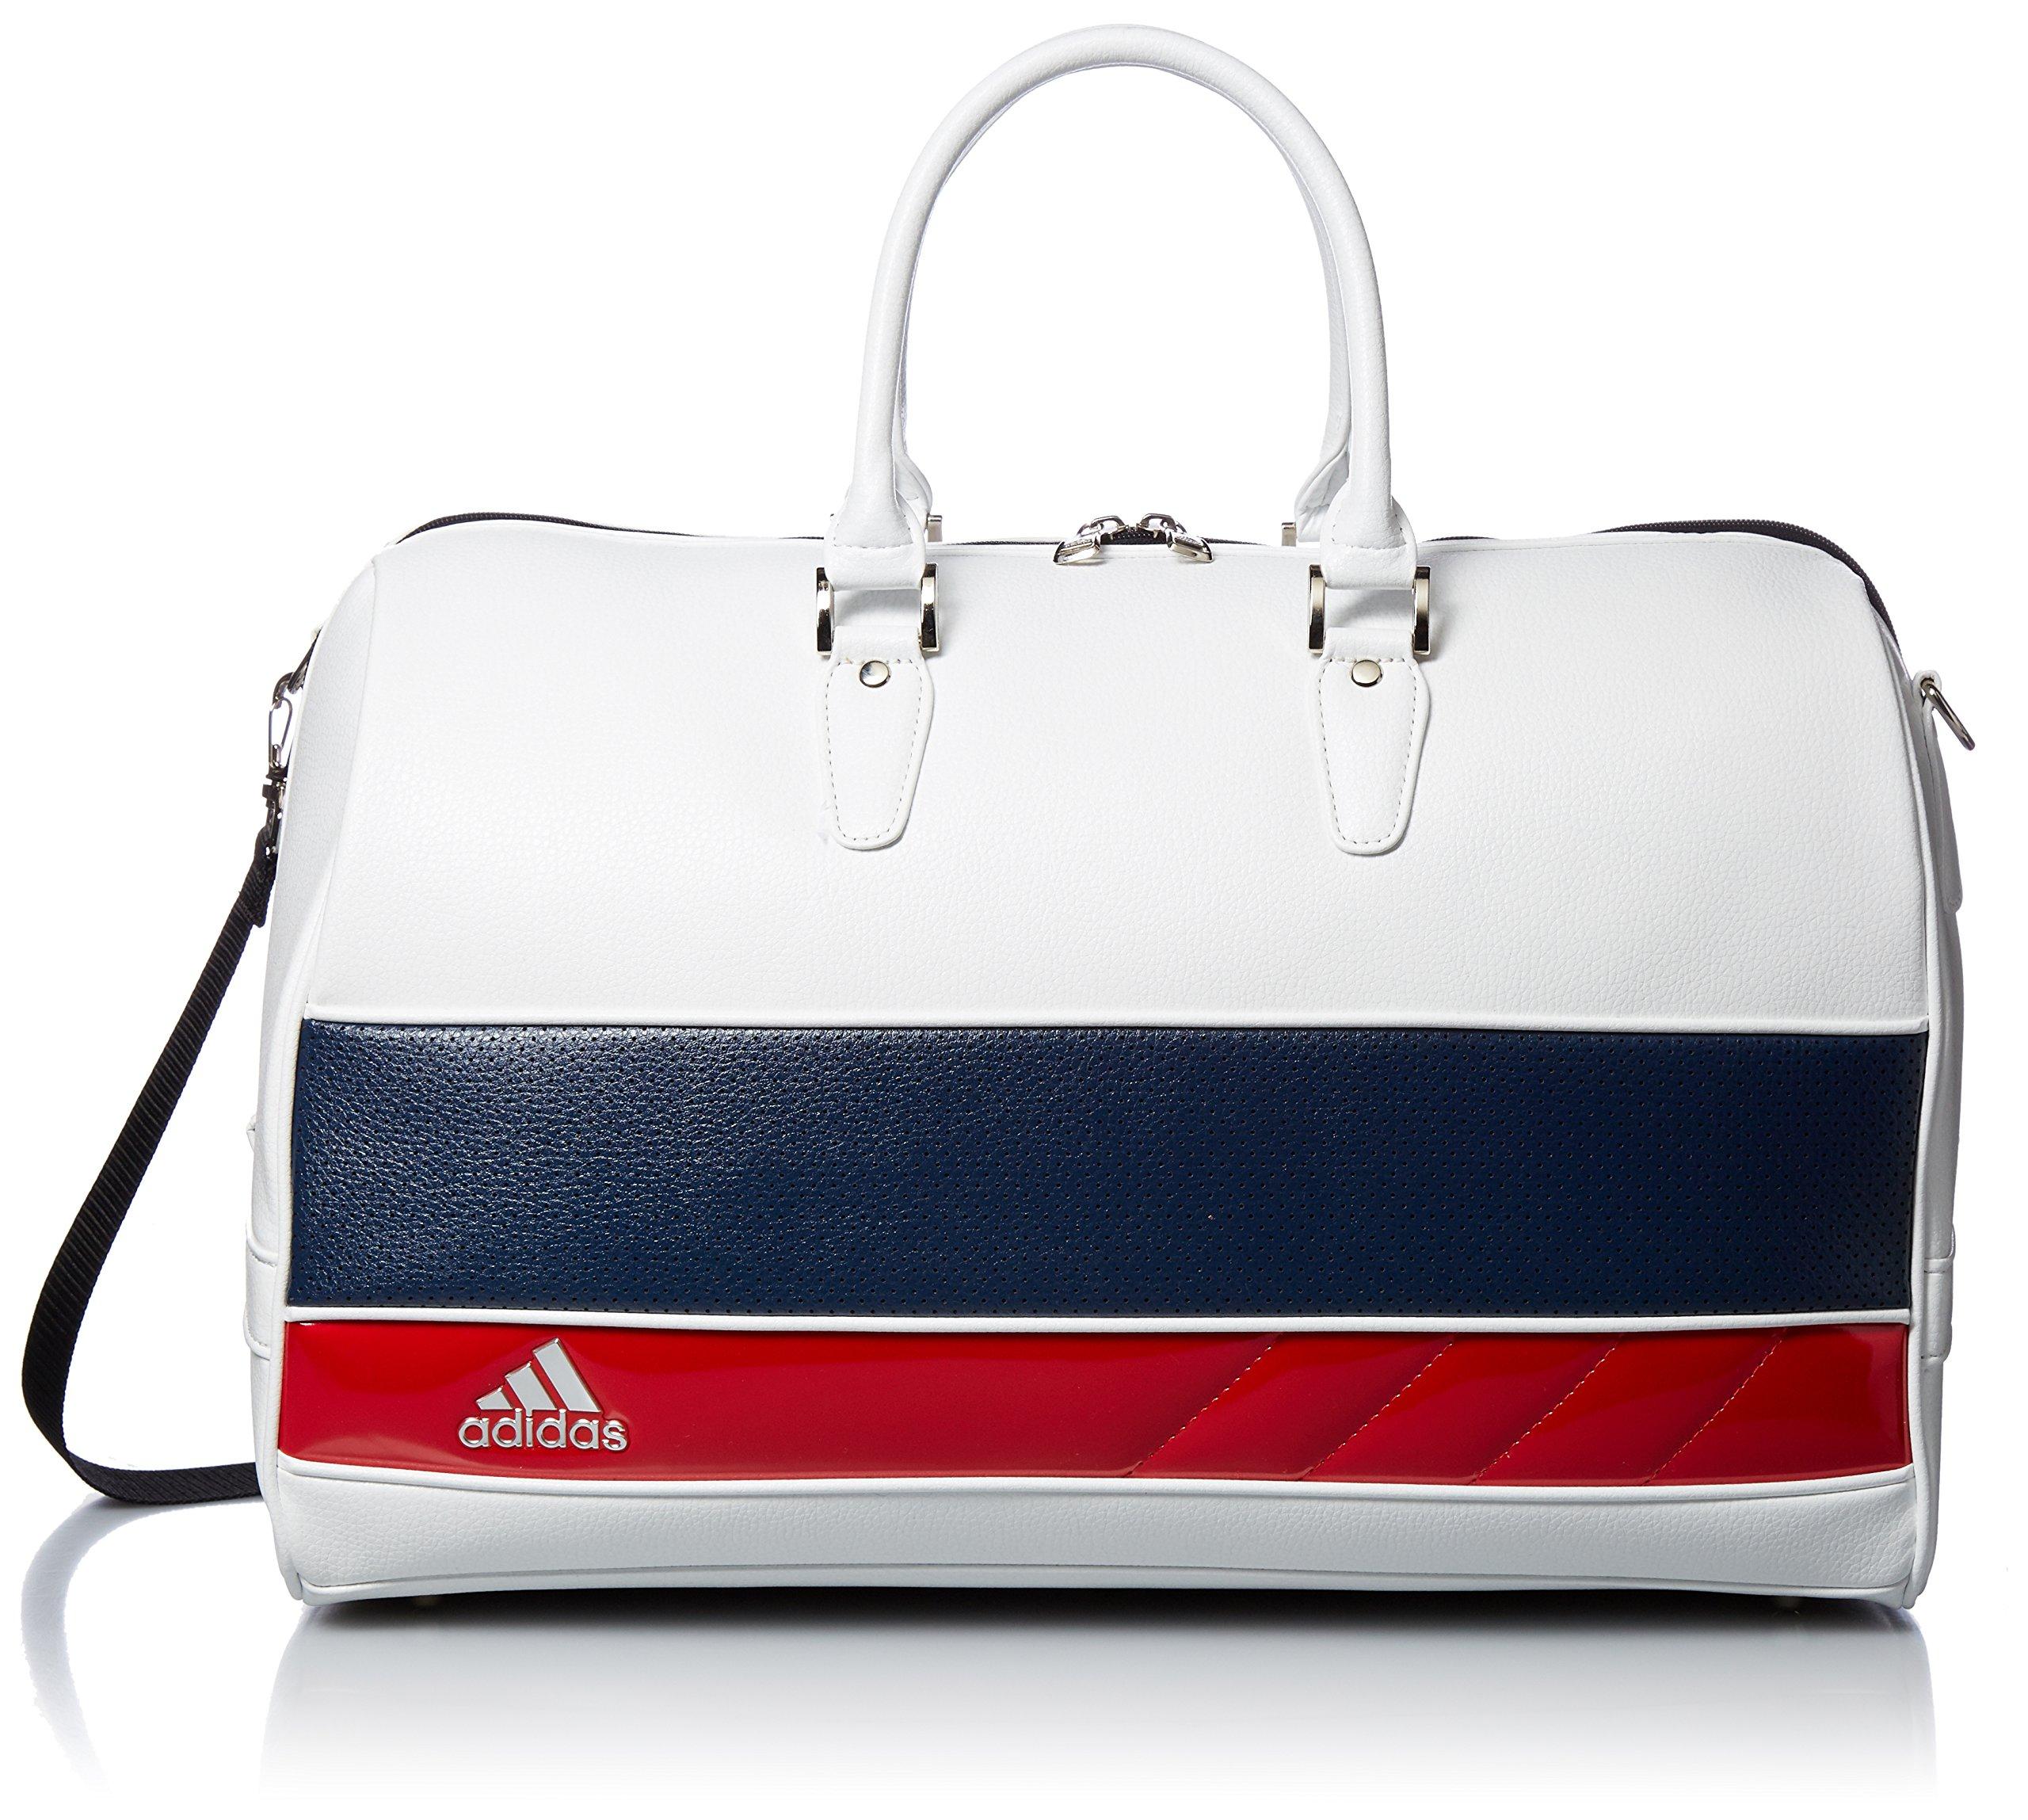 [adidas golf] Boston bag 3 shoe in pocket / deodorant name AWS18 A15696